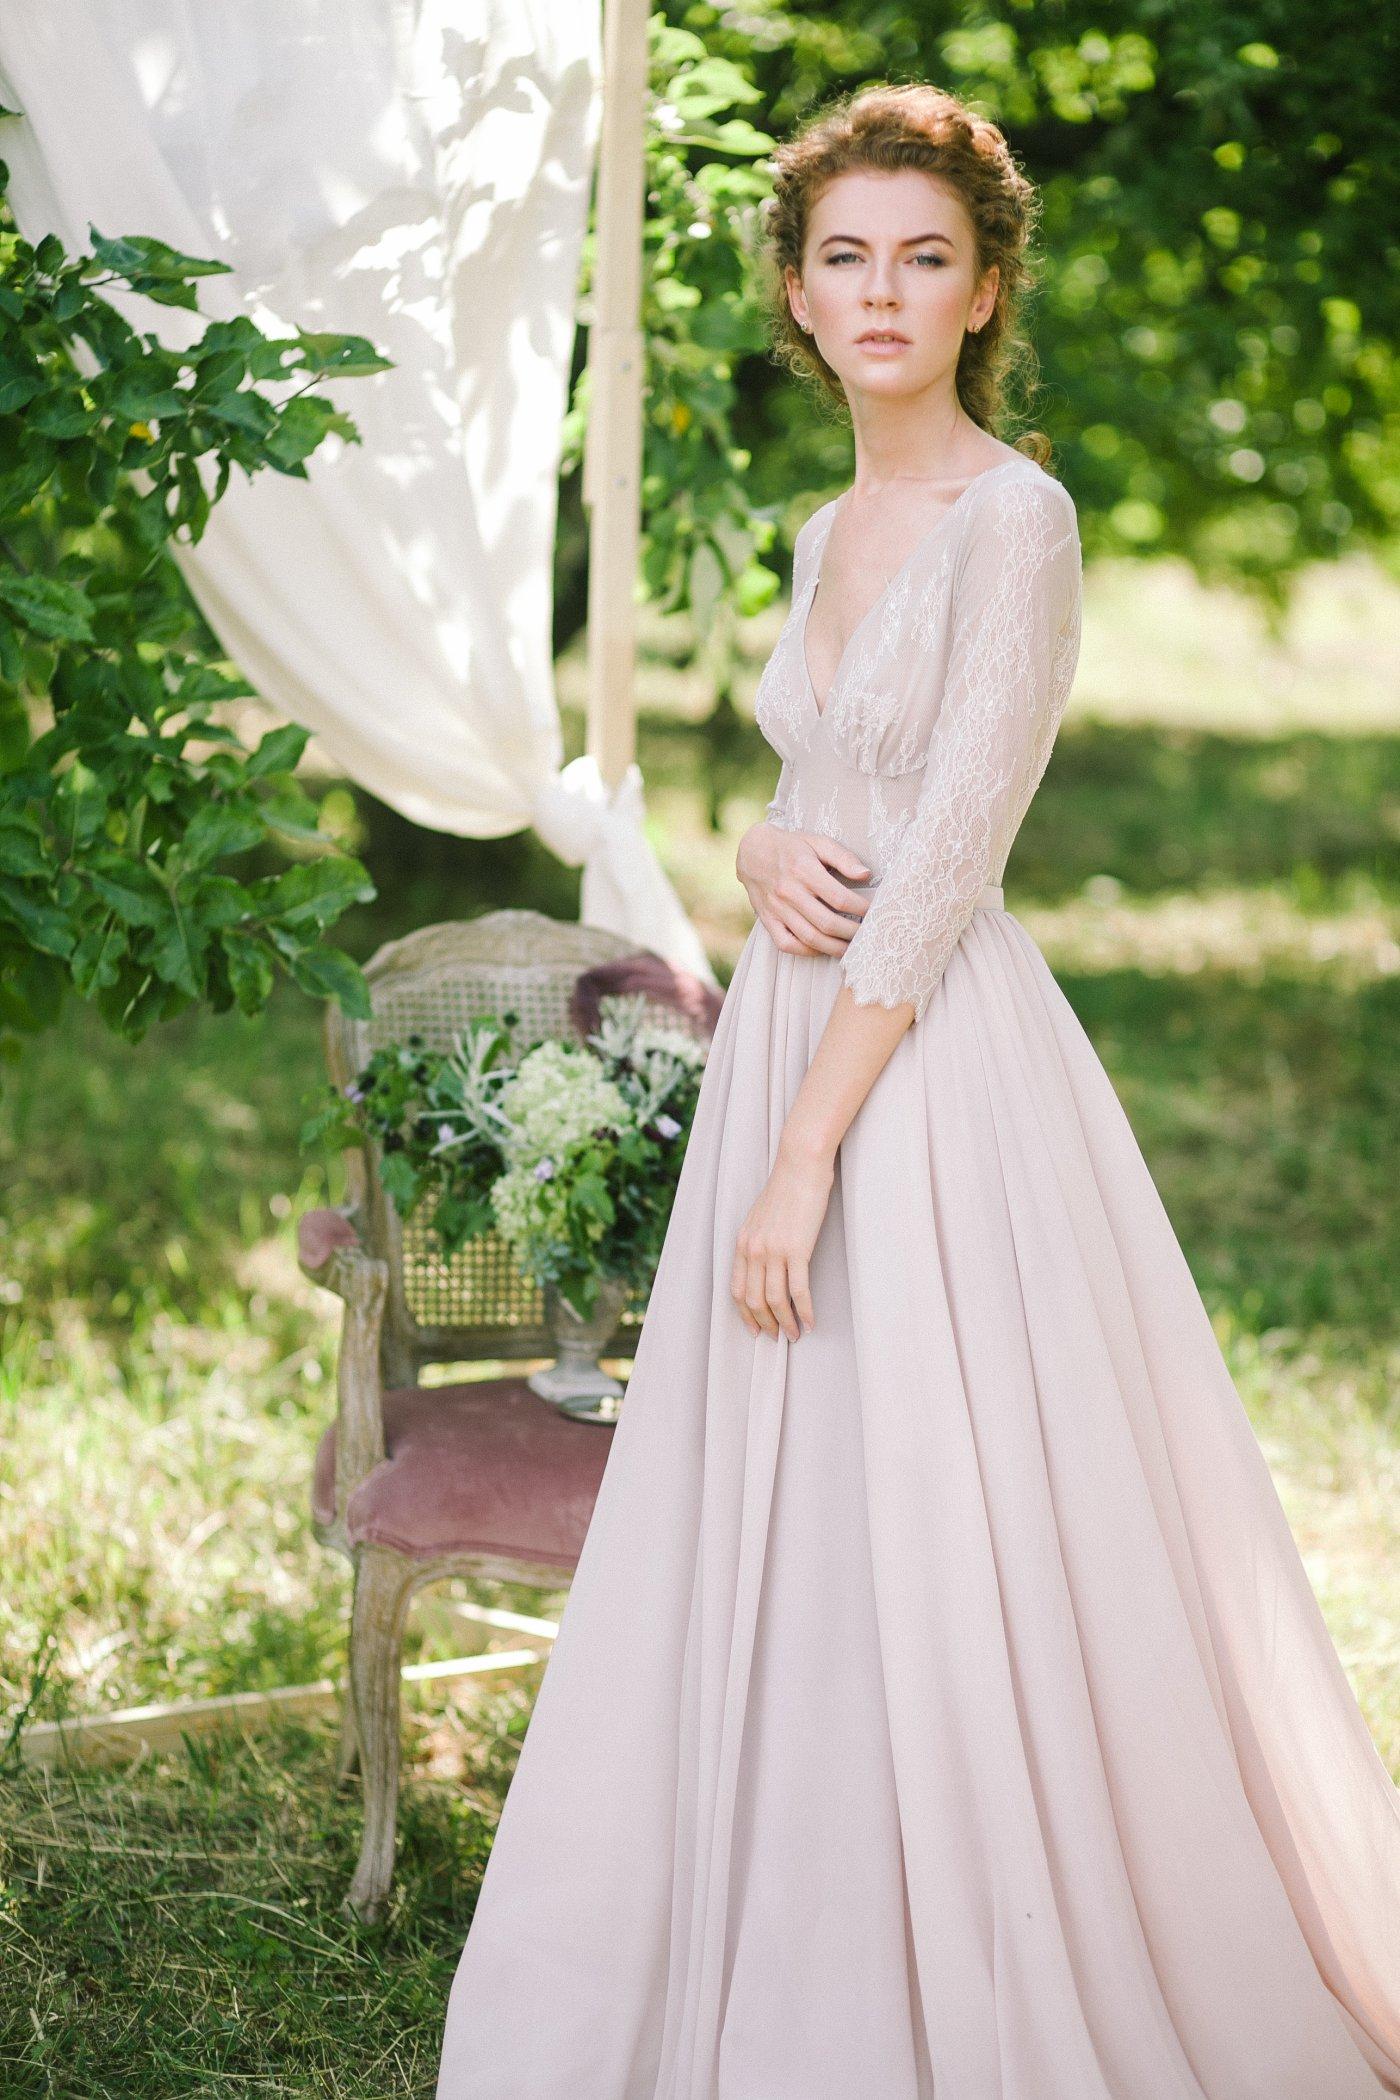 Non-corset a silhouette lavender wedding dress with a lace bodice ...